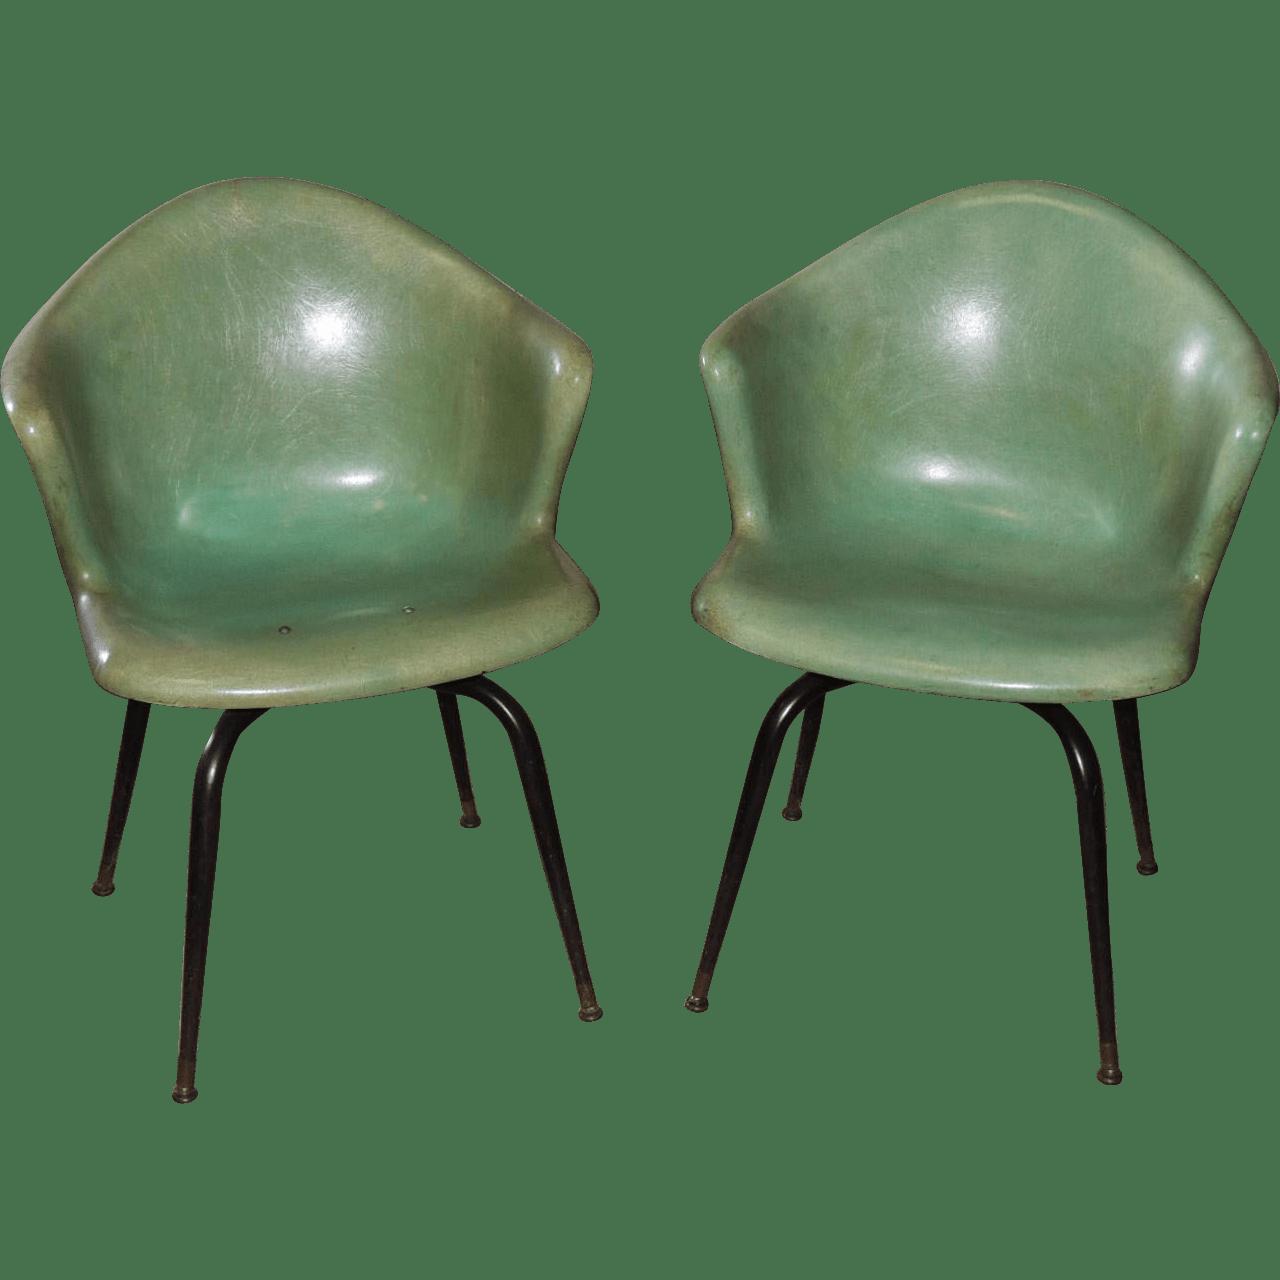 eames arm chair massage recliner chairs pair herman miller mid century fiberglass shell